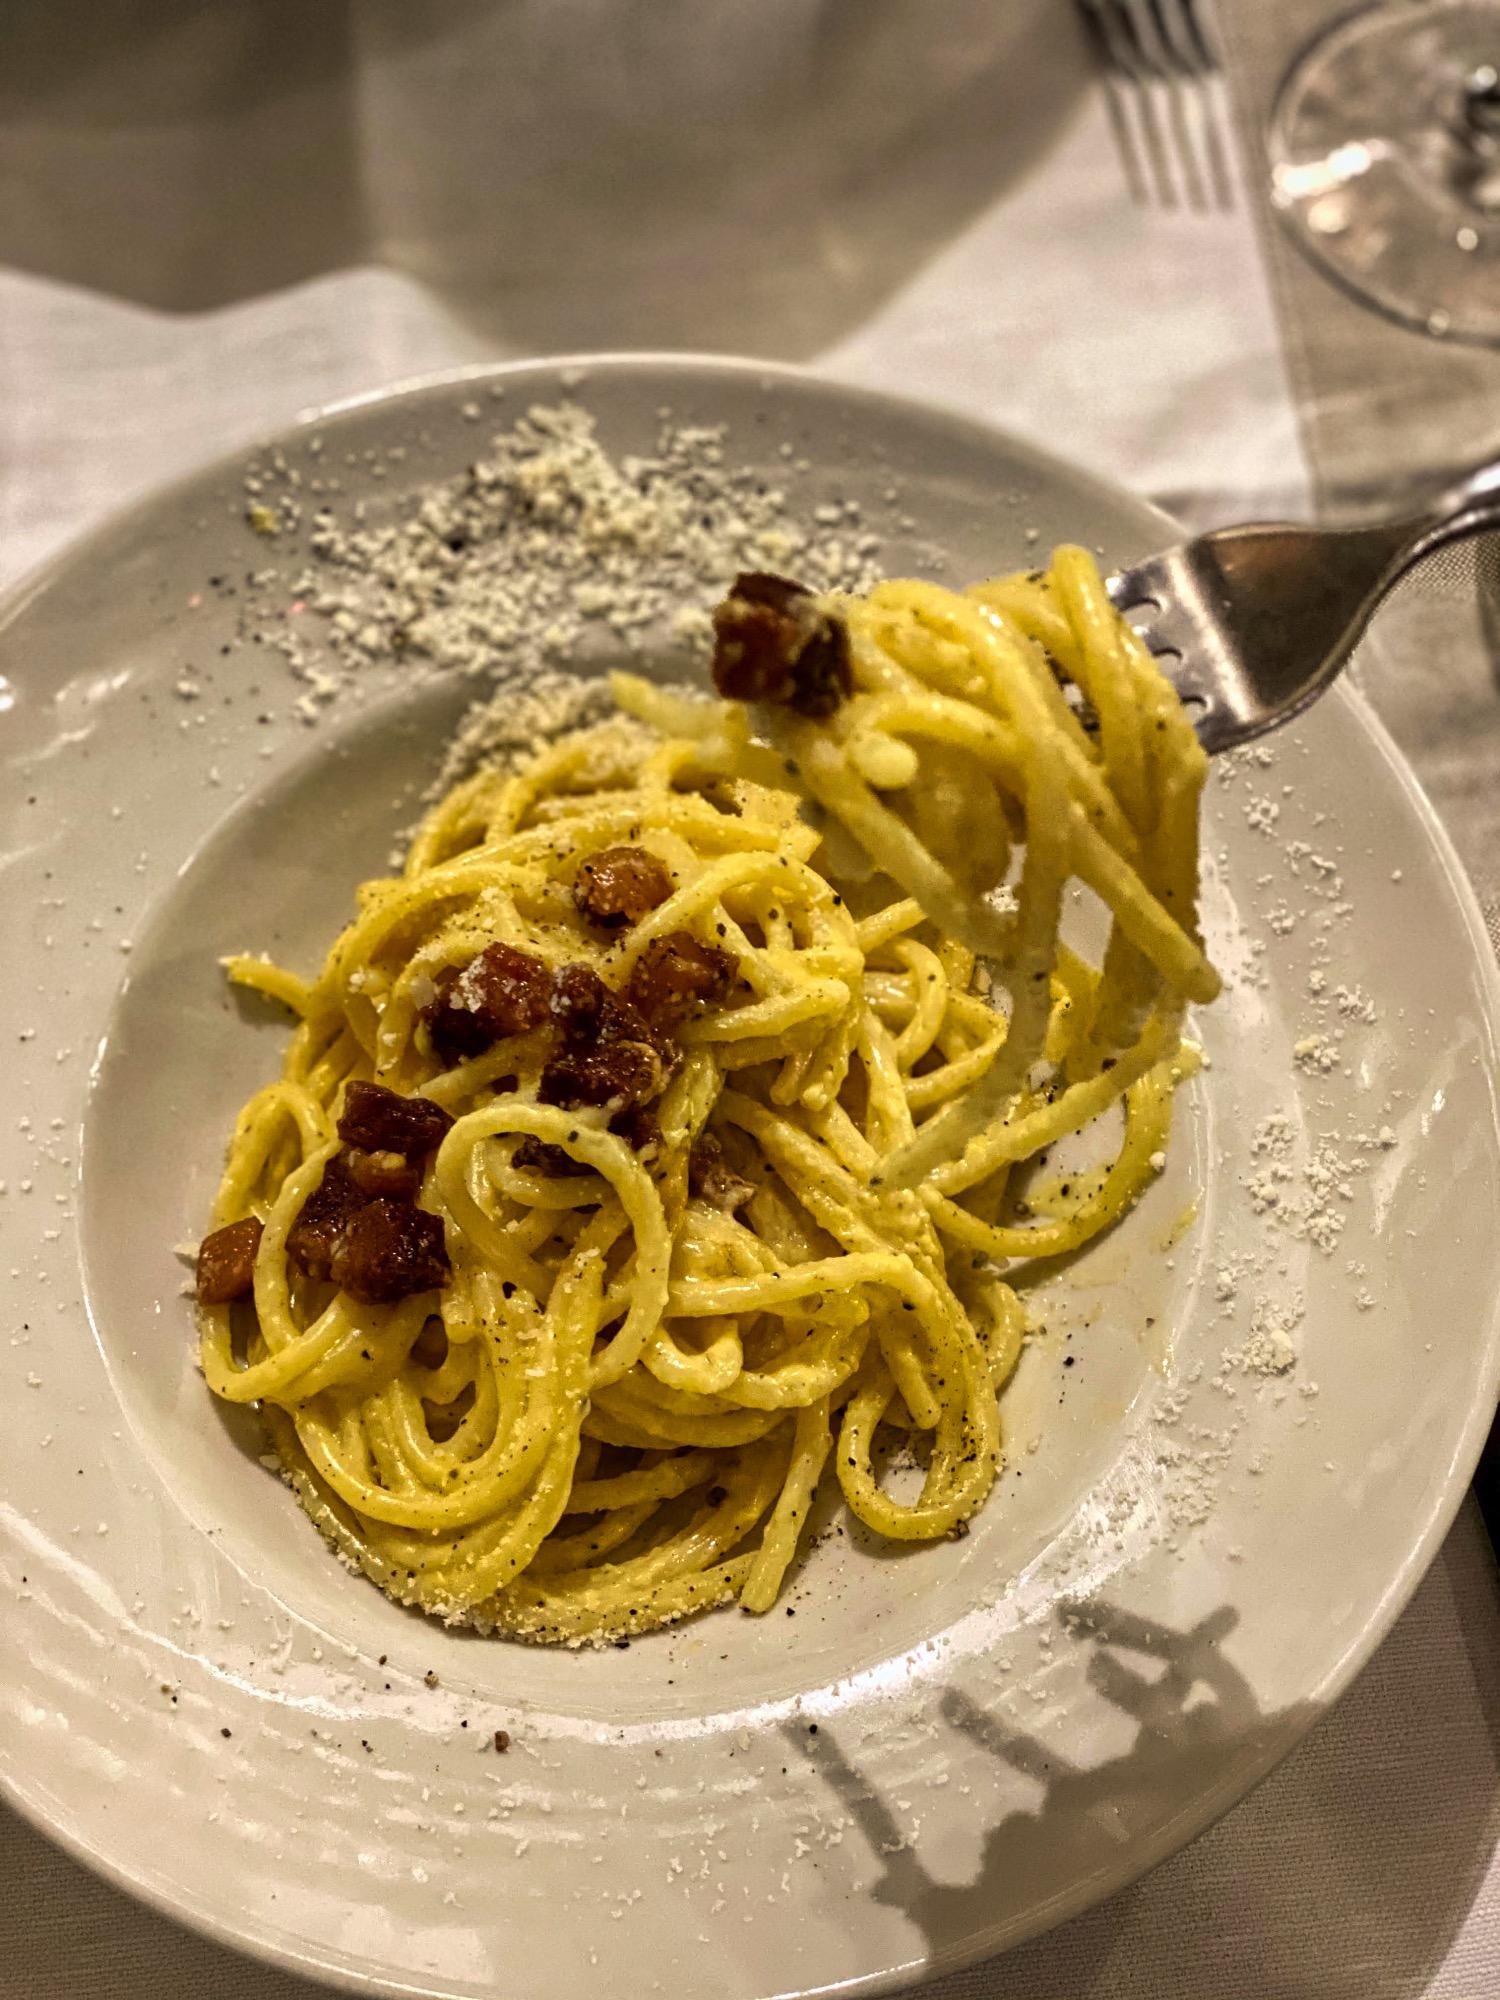 img_3491_carbonara_spaghetti_roma_santopalato_jokuti_vilagevo_l_f.jpeg